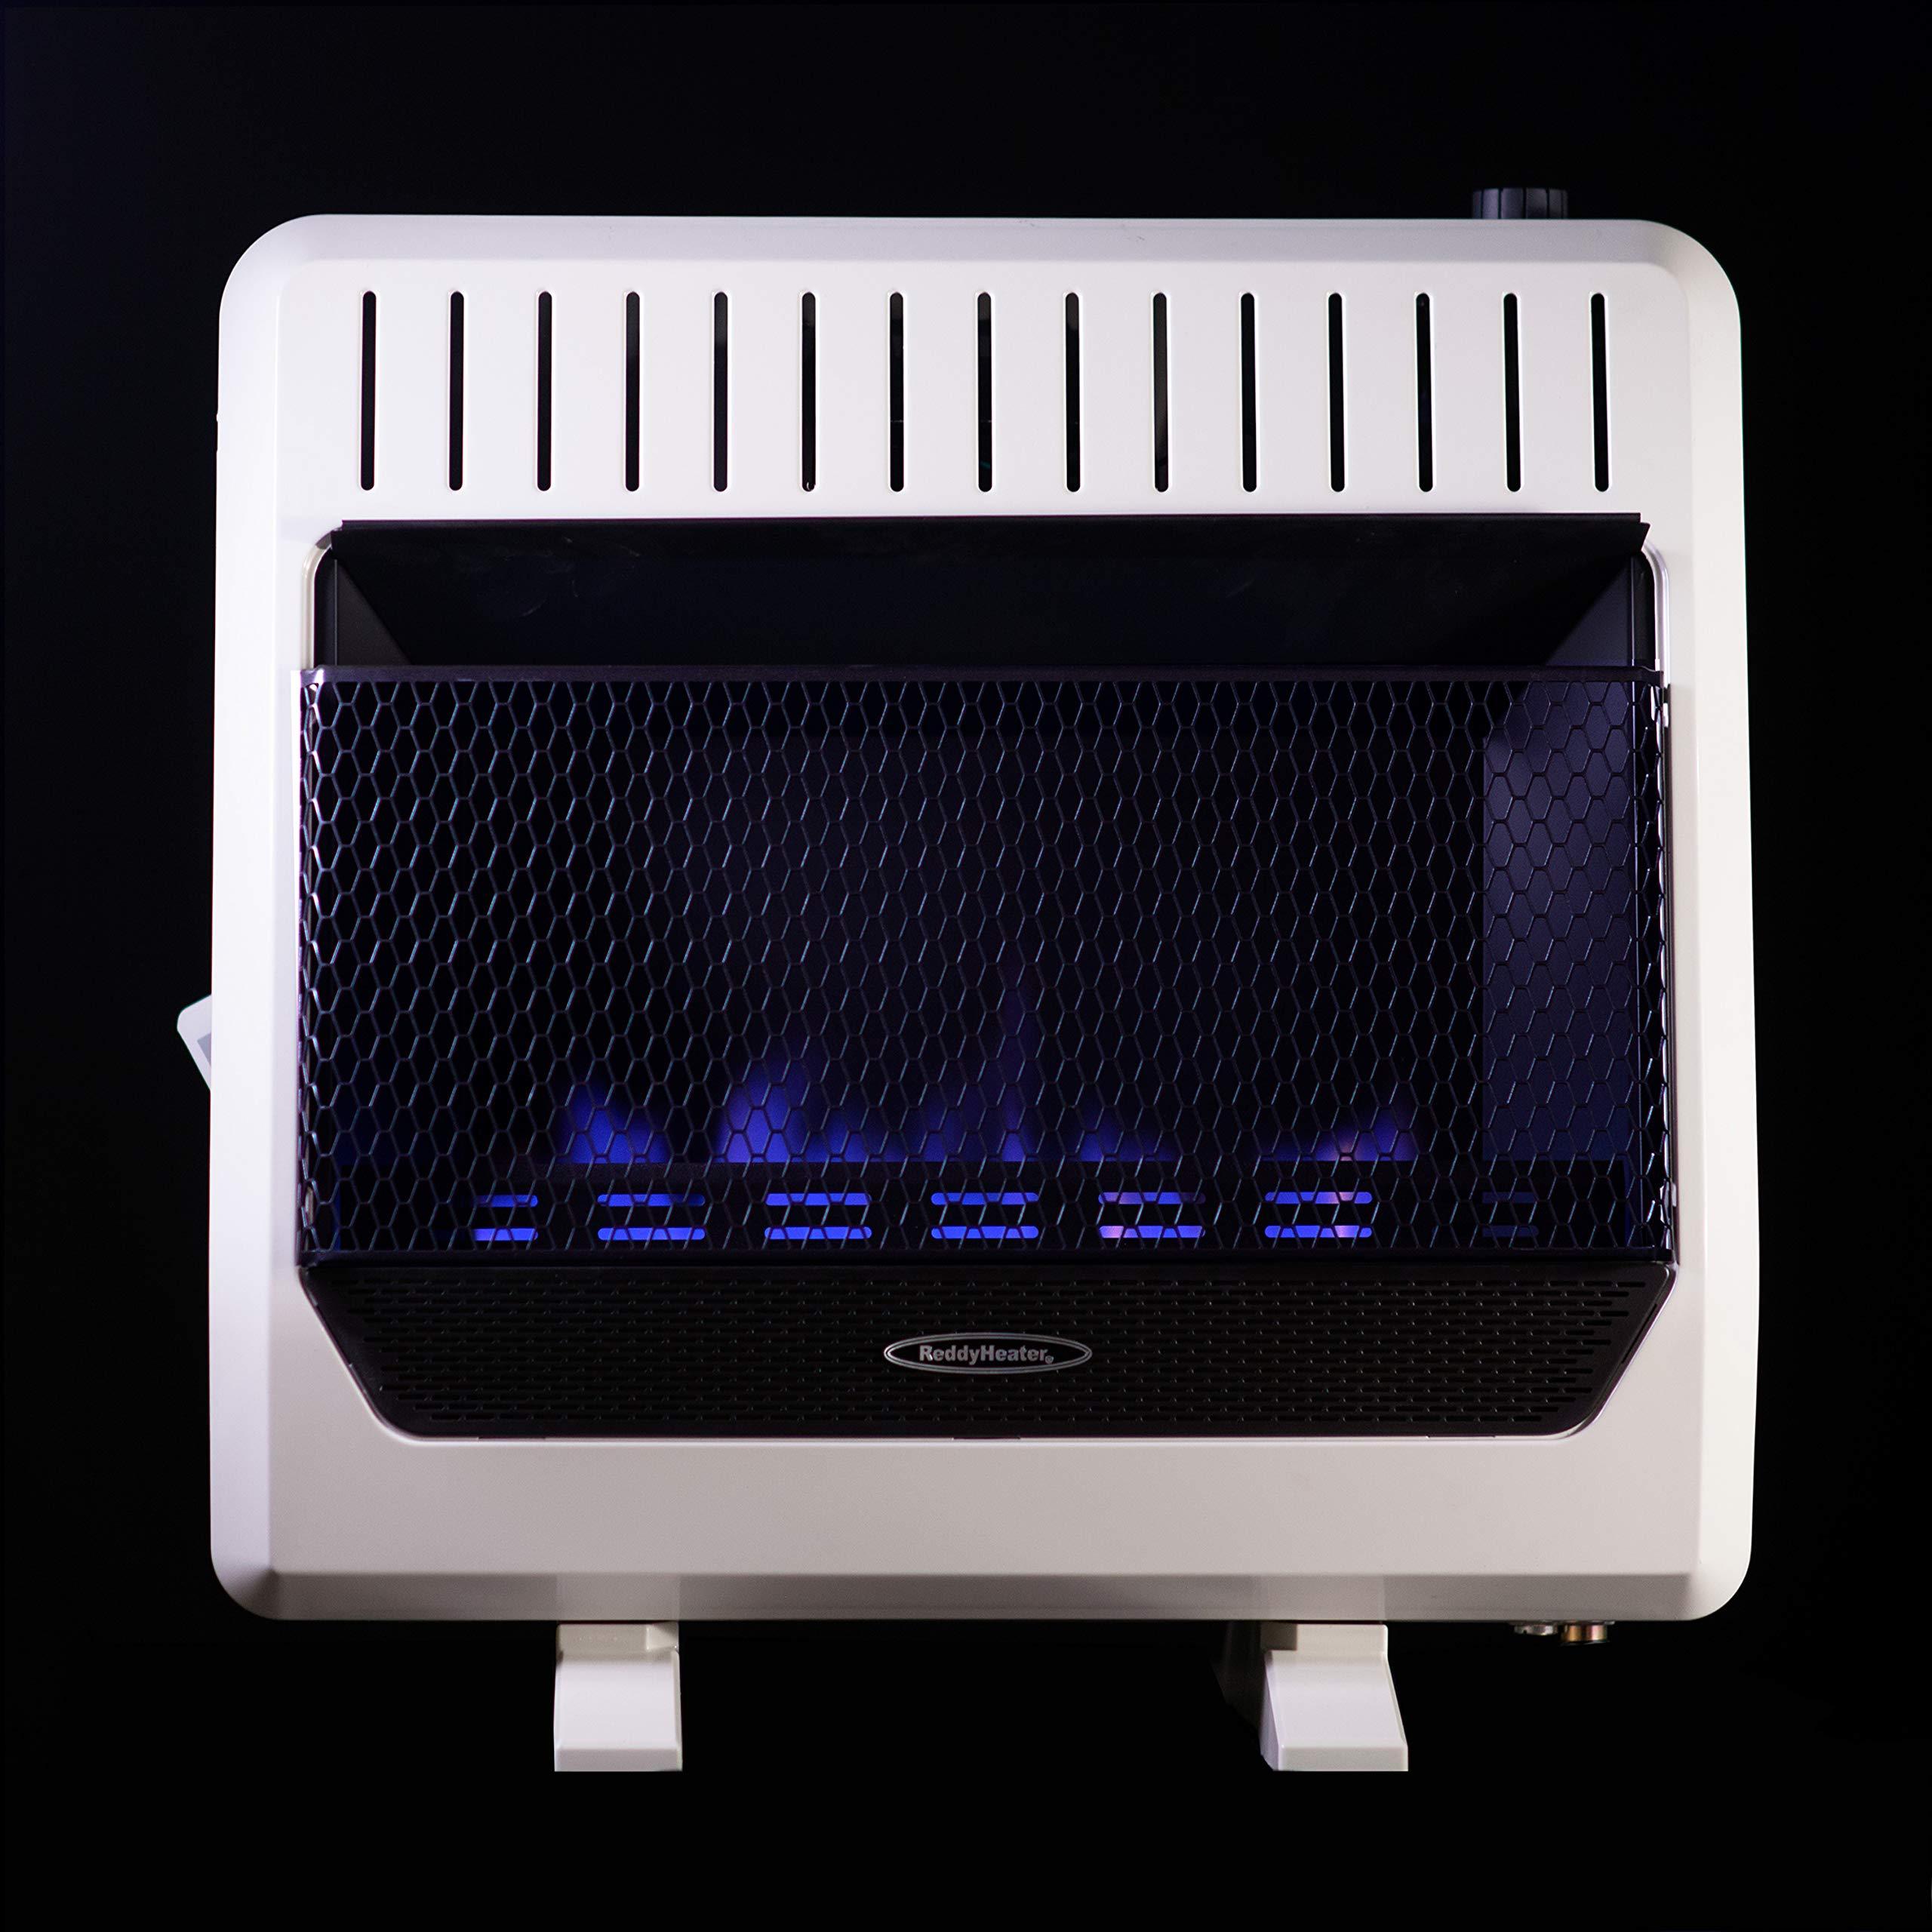 Sure Heat BWH30NLTE Dual Fuel Flame Wall or Floor Mount Heater, 30K BTU, Beige/Tan/Blue by Sure Heat